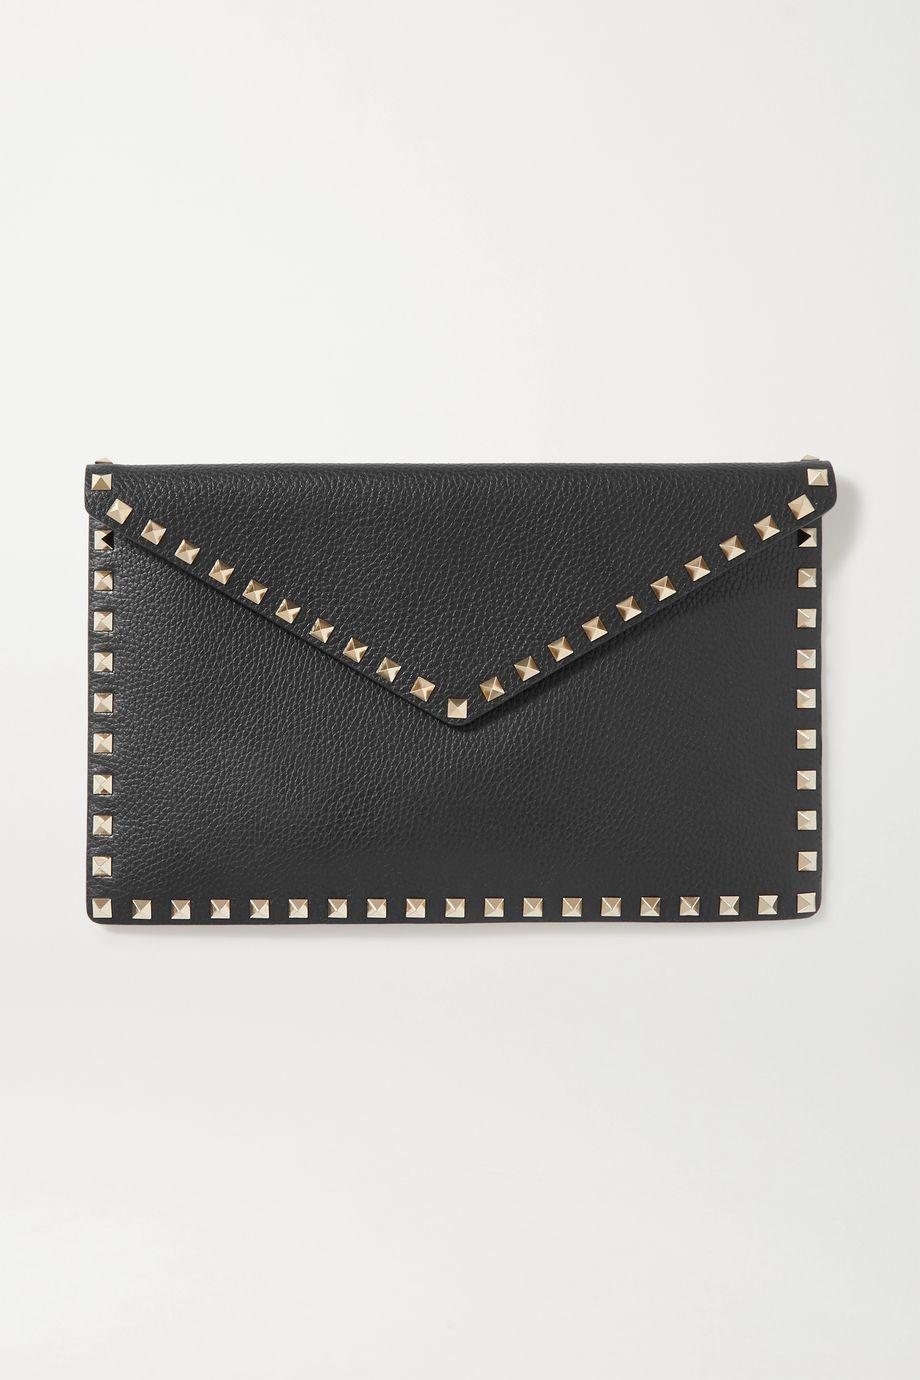 Valentino Valentino Garavani Rockstud large textured-leather pouch